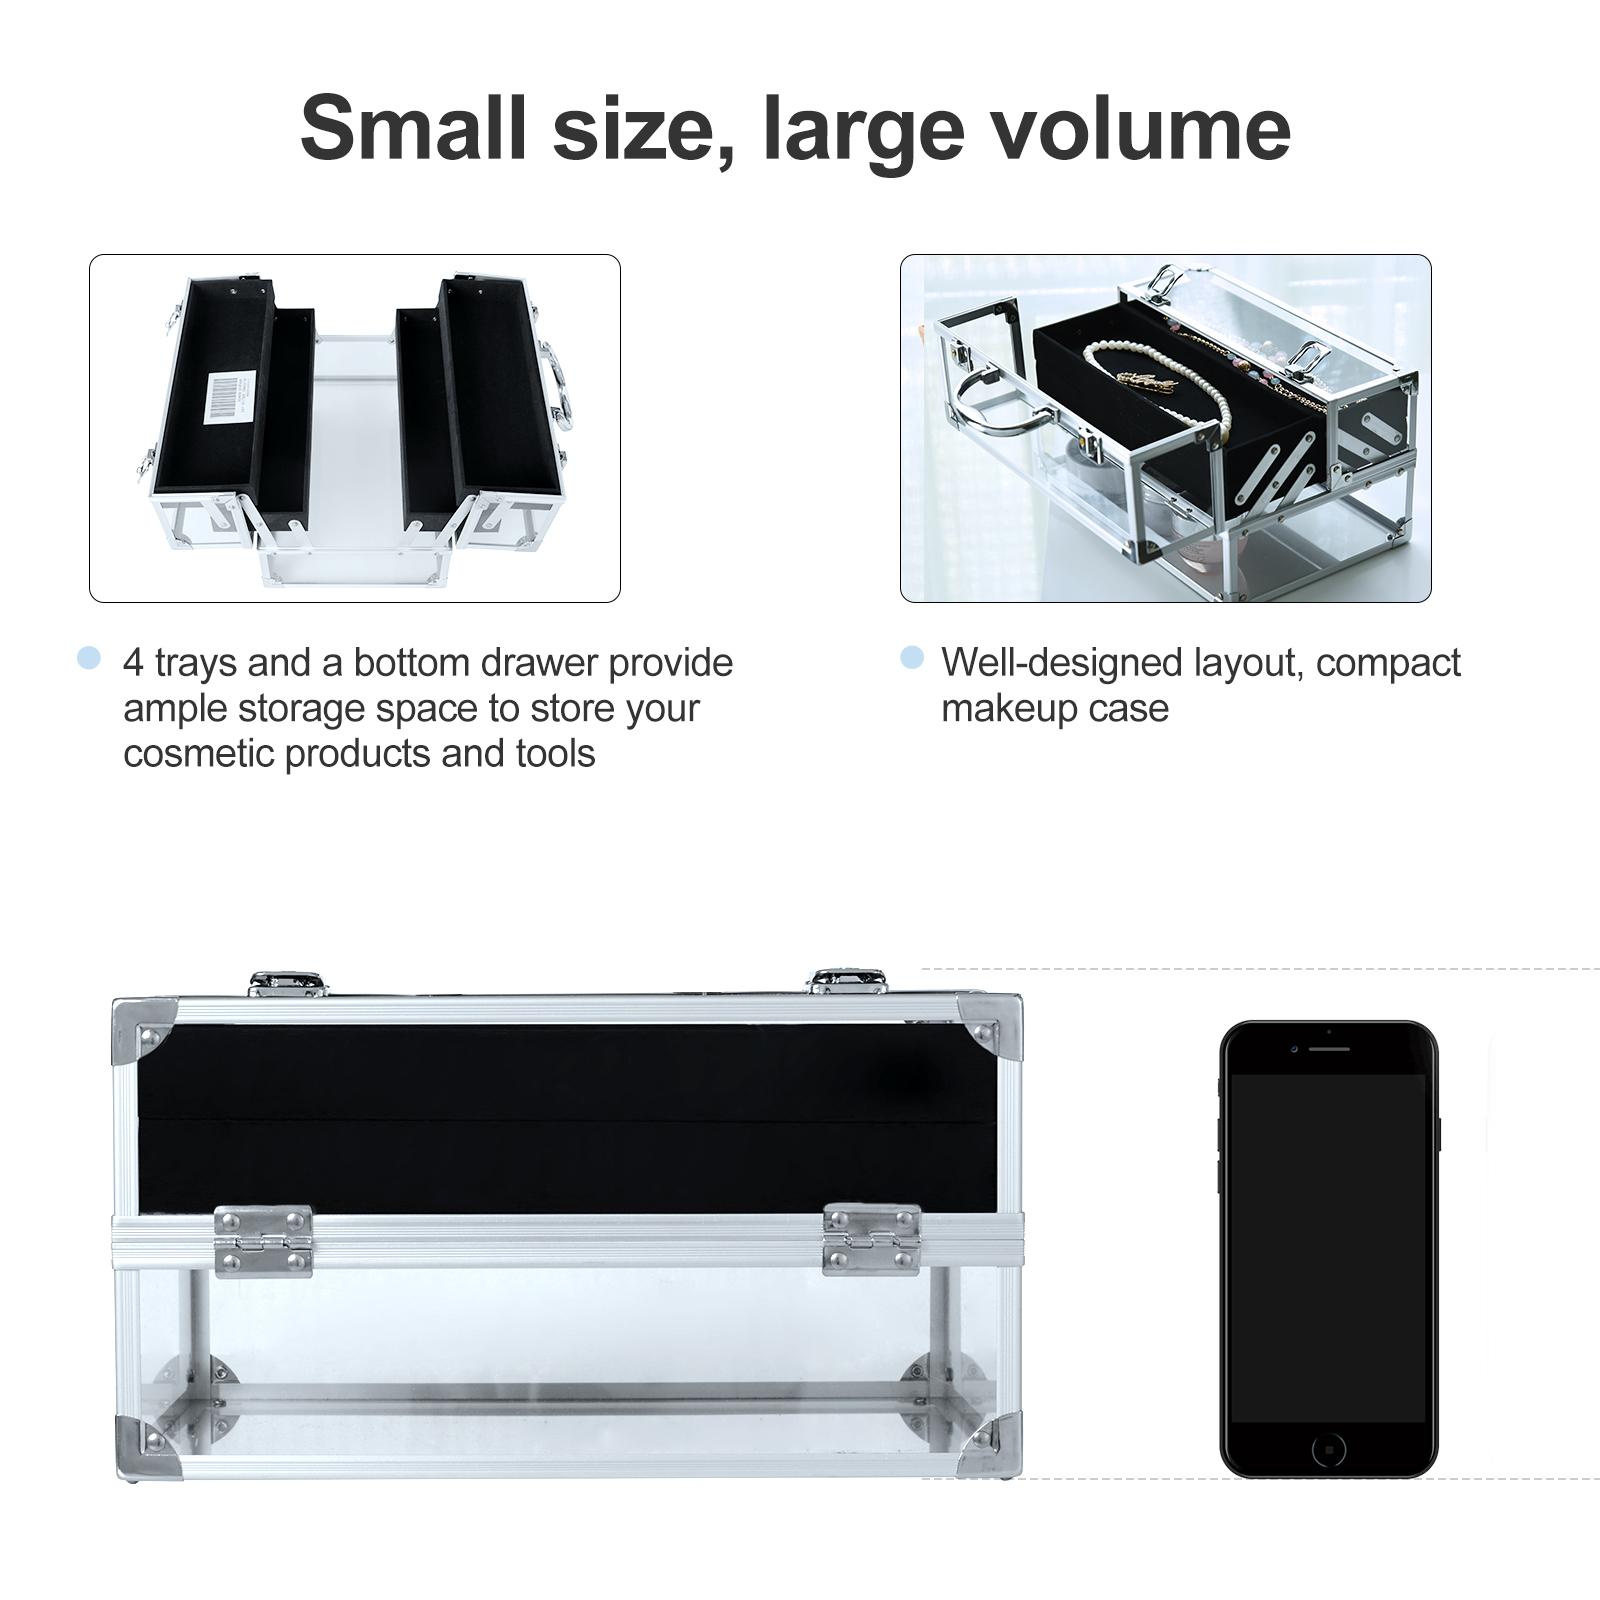 Portable-Makeup-Case-Train-Case-Lockable-Aluminum-with-4-Trays thumbnail 20